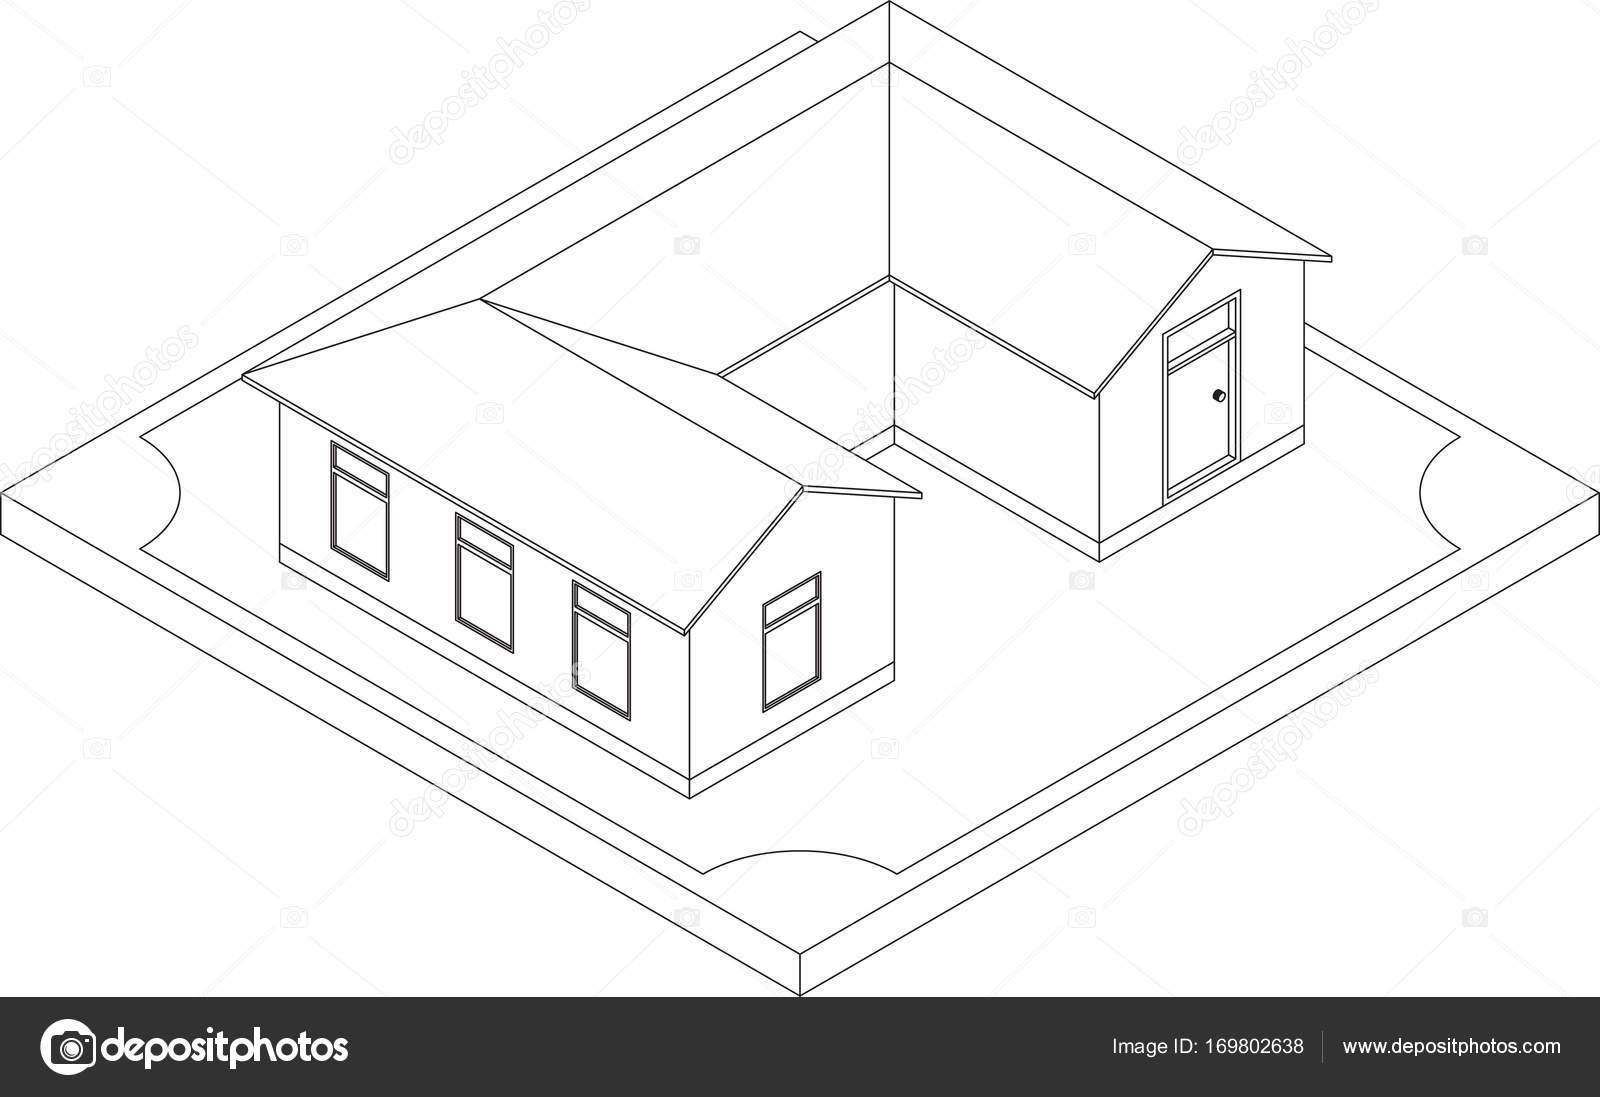 Contour of isometric house — Stock Vector © Sergeymarkov #169802638